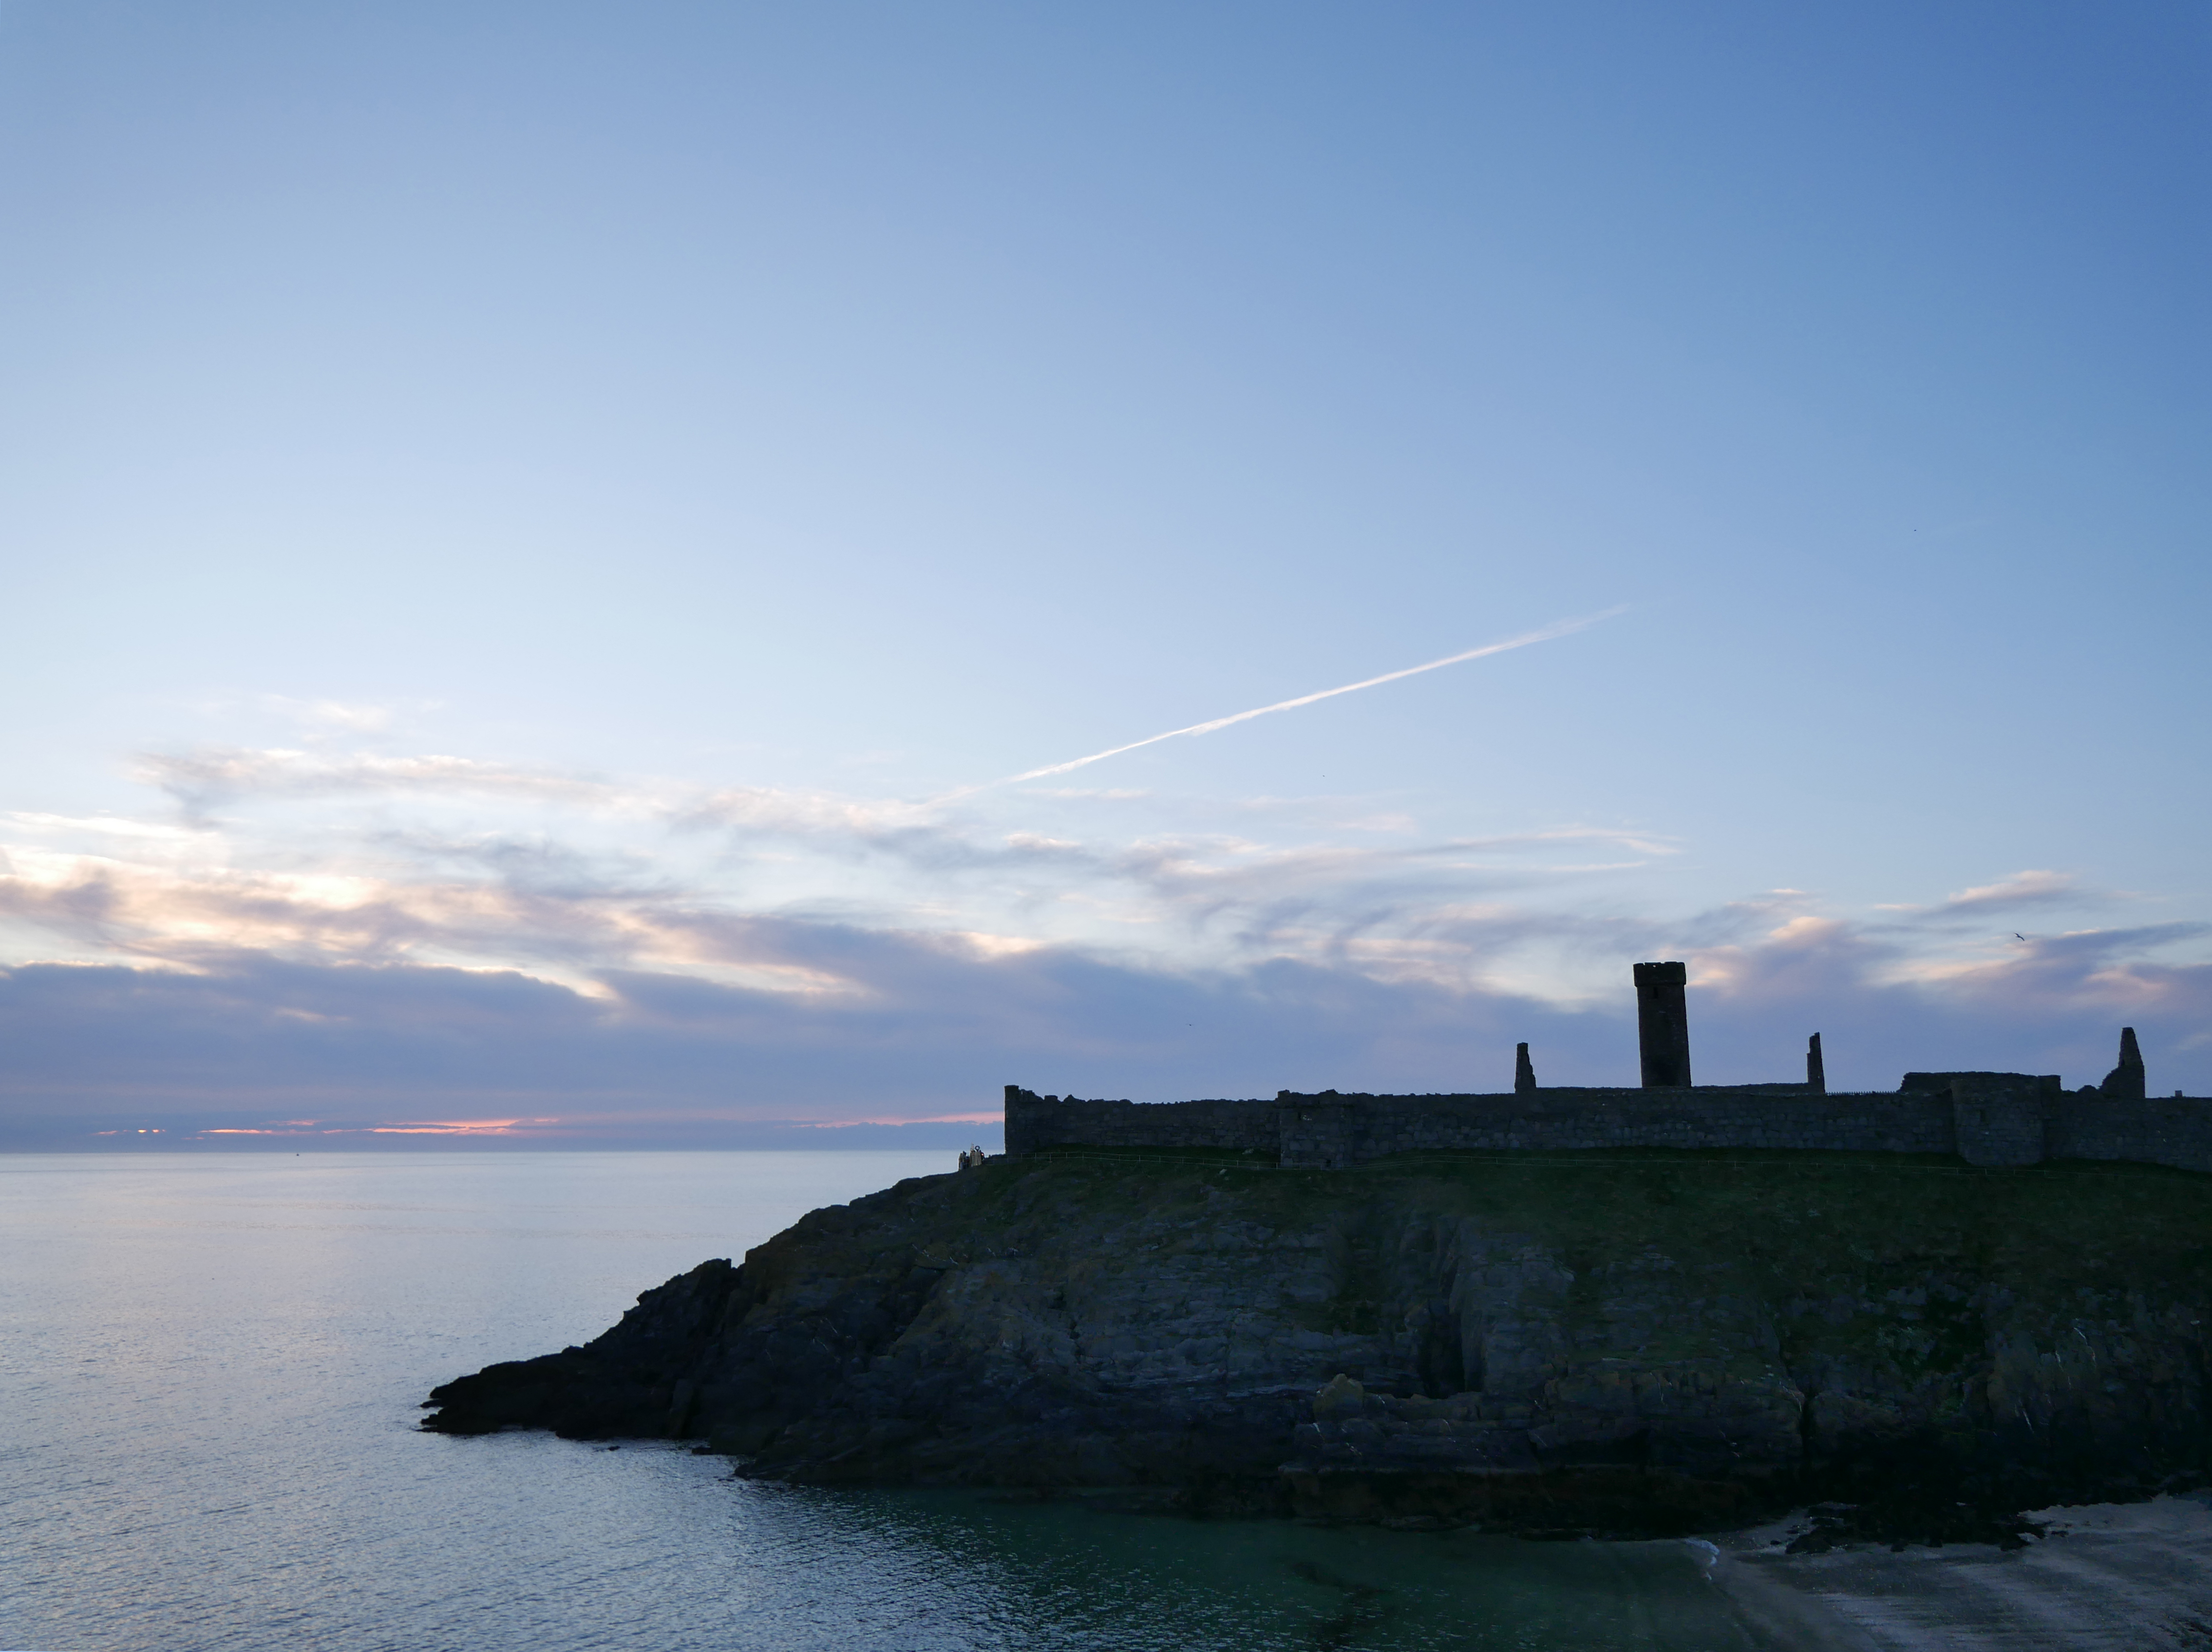 Peel Castle at Oie Voaldyn, Grass, Isle of Man, Landscape, Manx Culture, HQ Photo